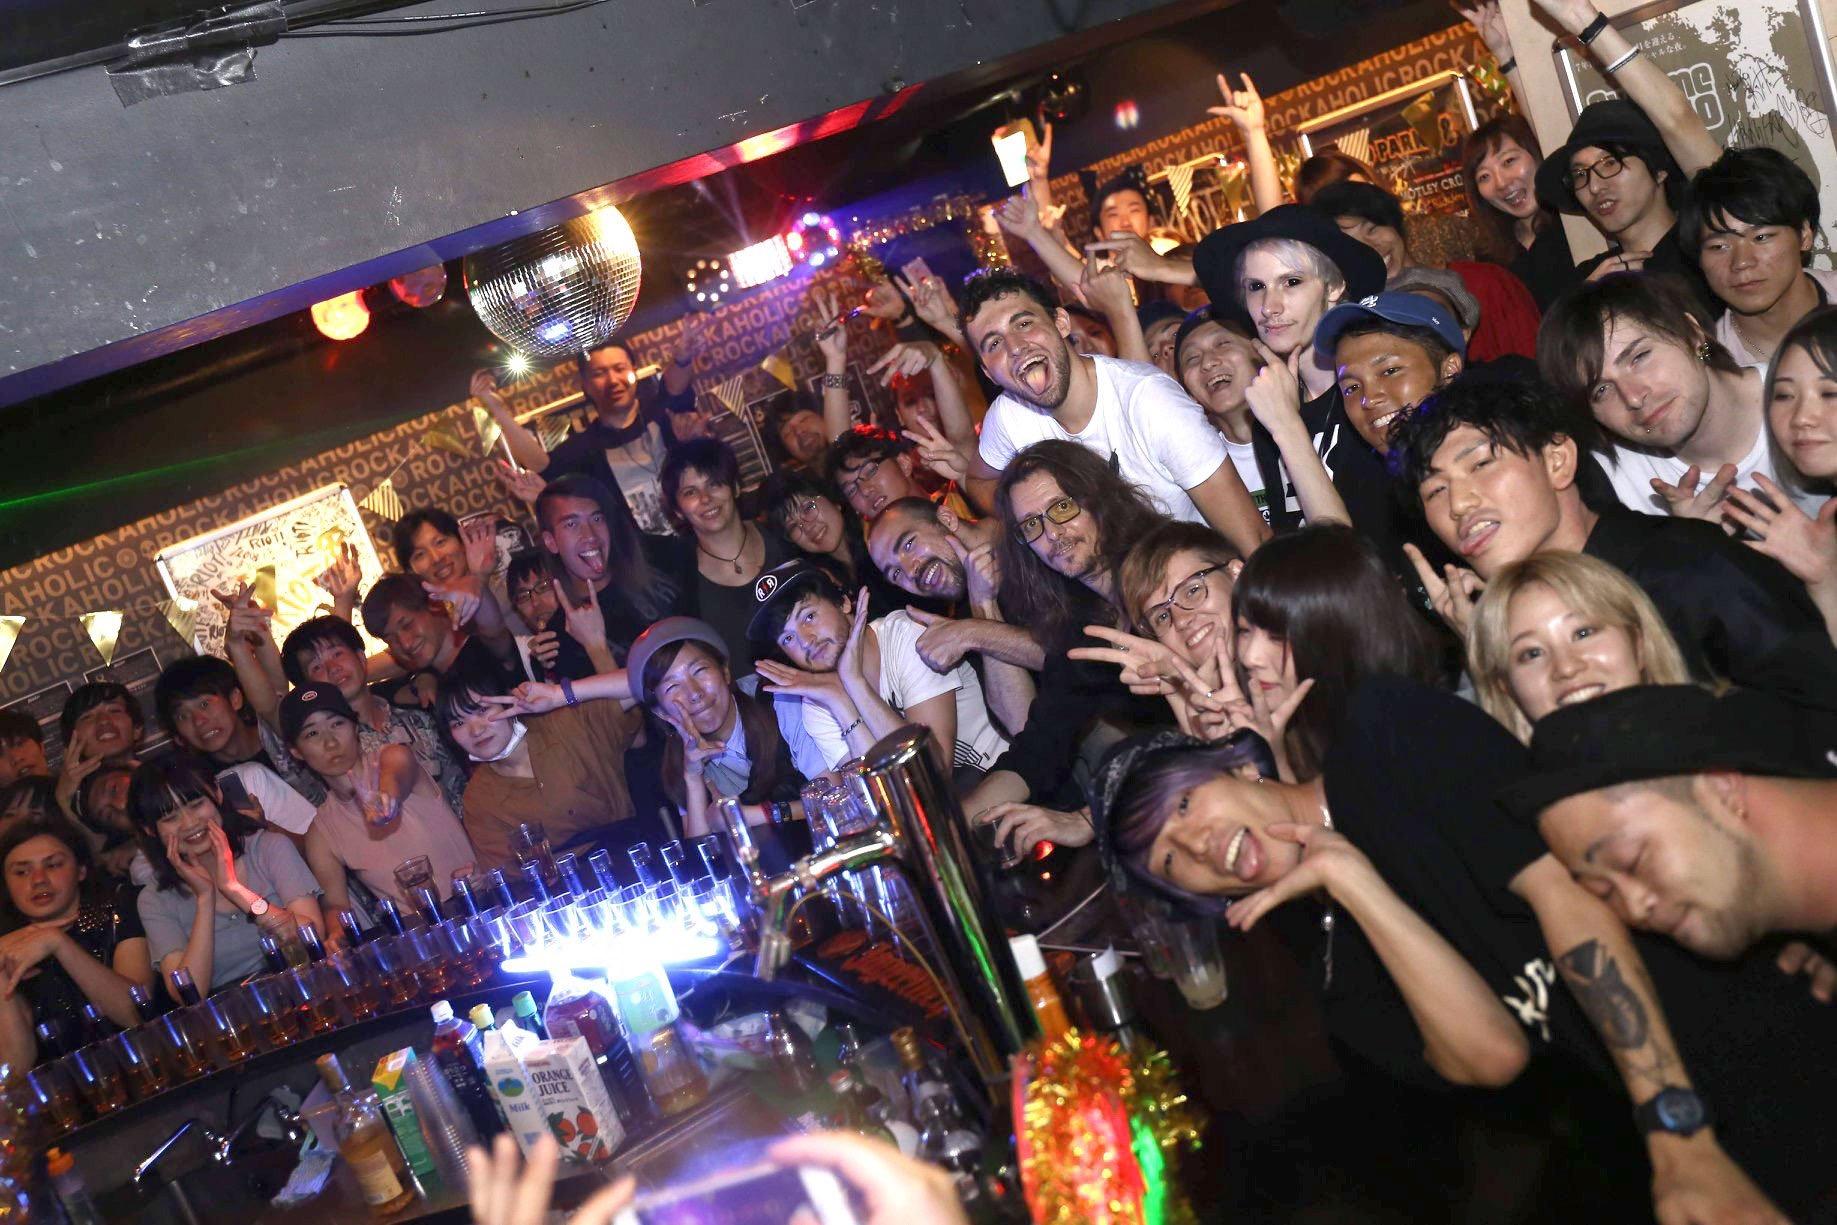 https://bar-rockaholic.jp/shibuya/blog/24D43711-8195-4D2C-BBDA-3401443FEFB3.jpeg